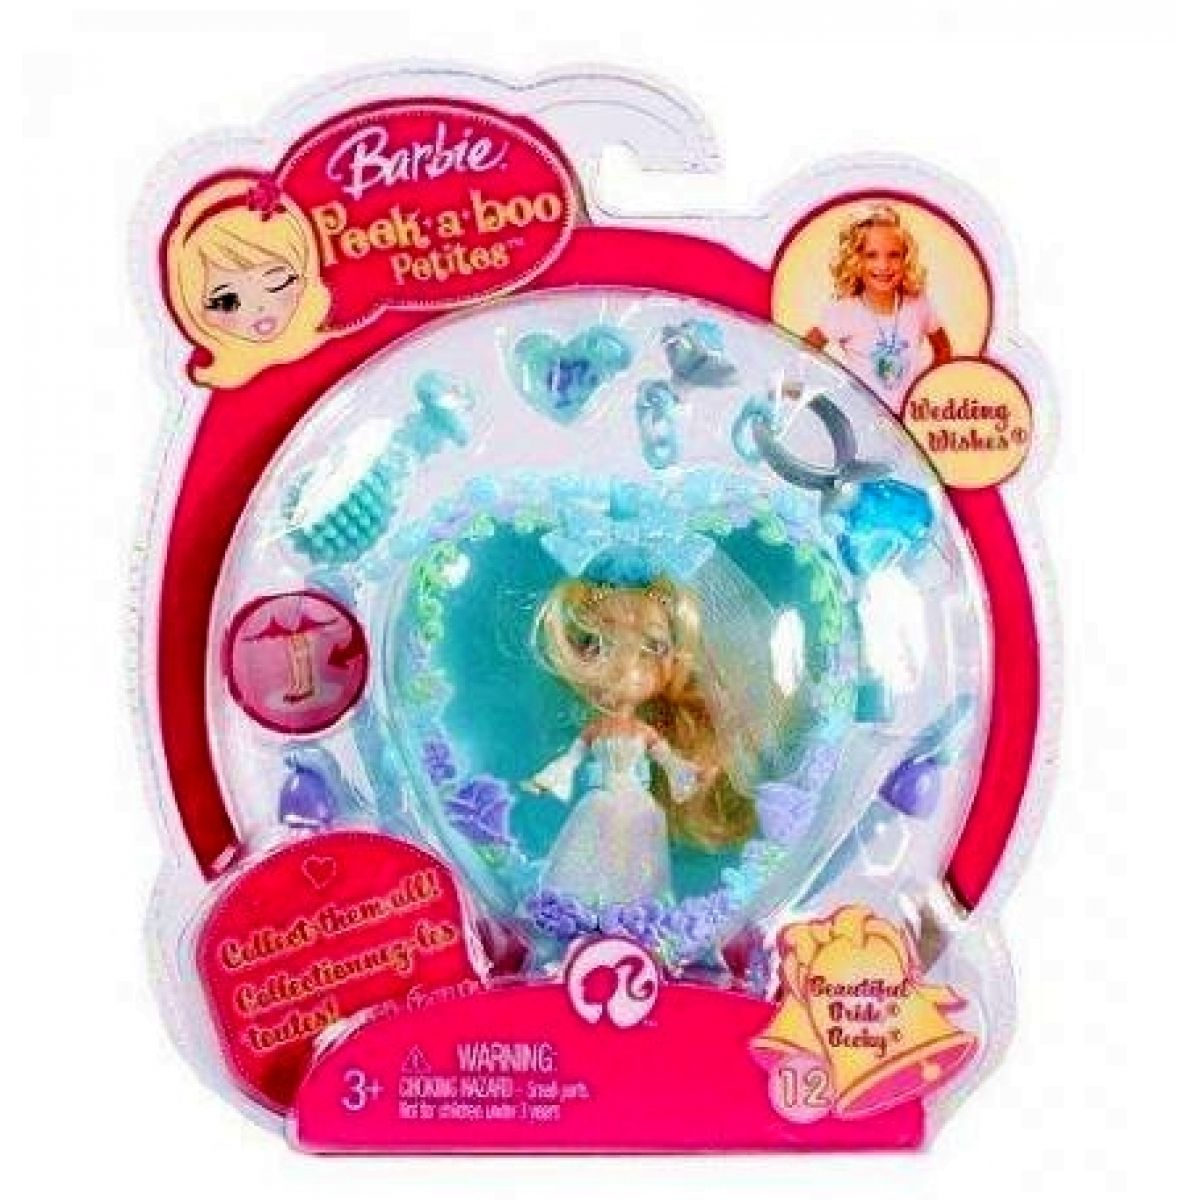 Barbie M8779_N6645 - Barbie Petites Club set č.74